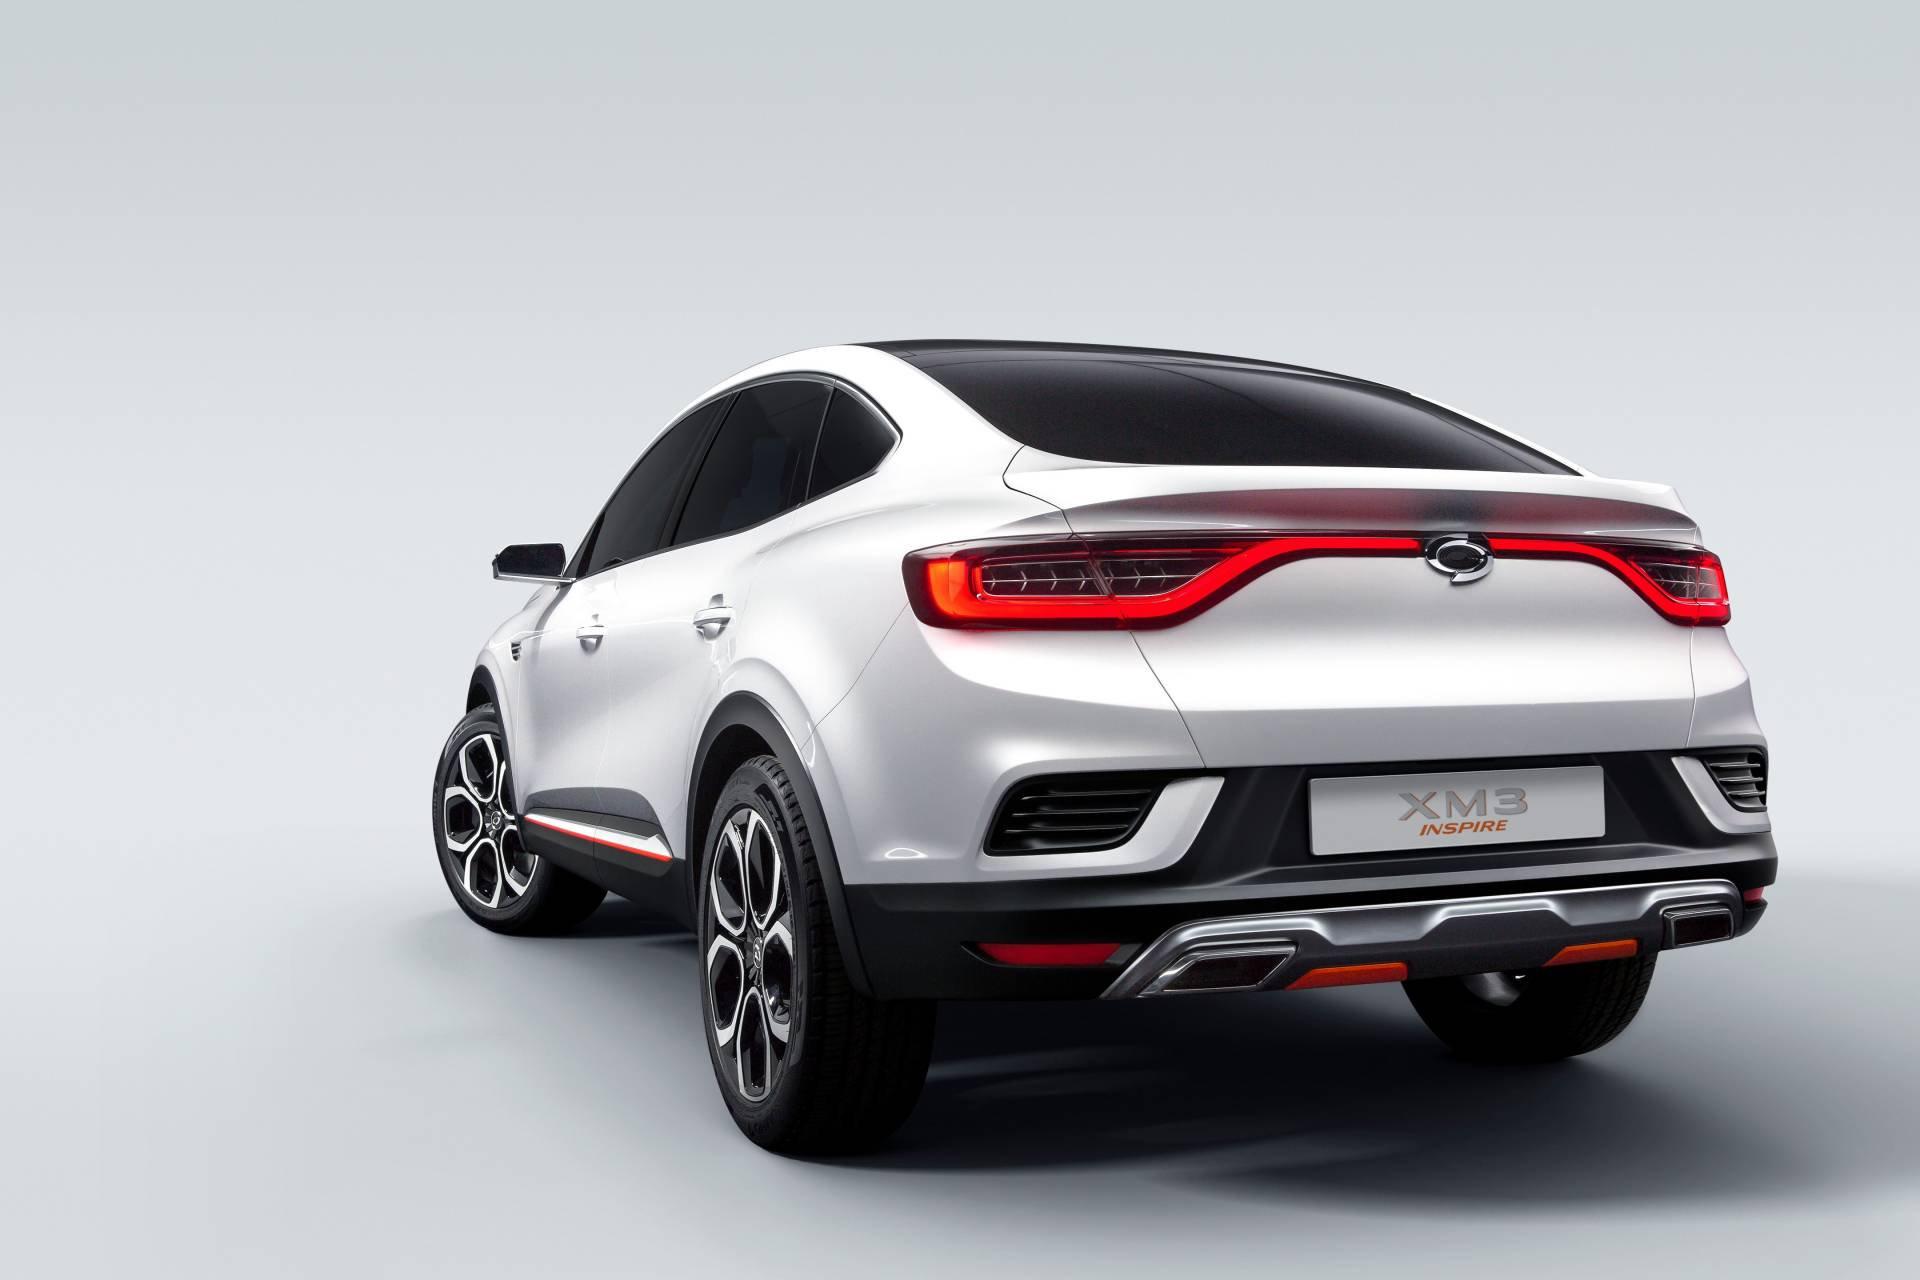 Renault-Samsung-XM3-Inspire-Concept-5